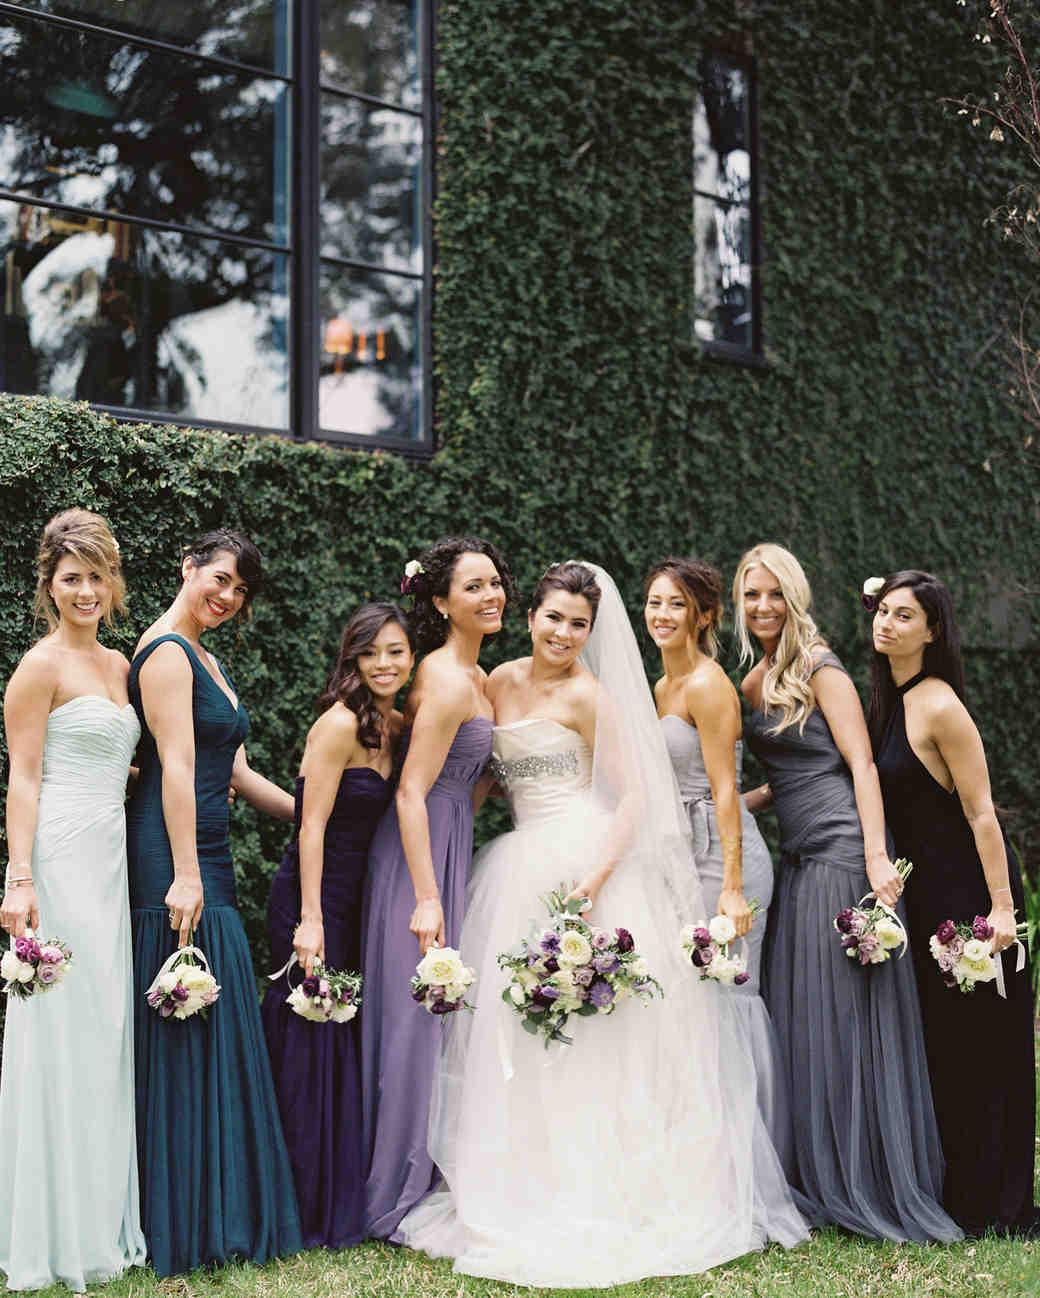 stacey-adam-wedding-bridesmaids-0056-s112112-0815.jpg